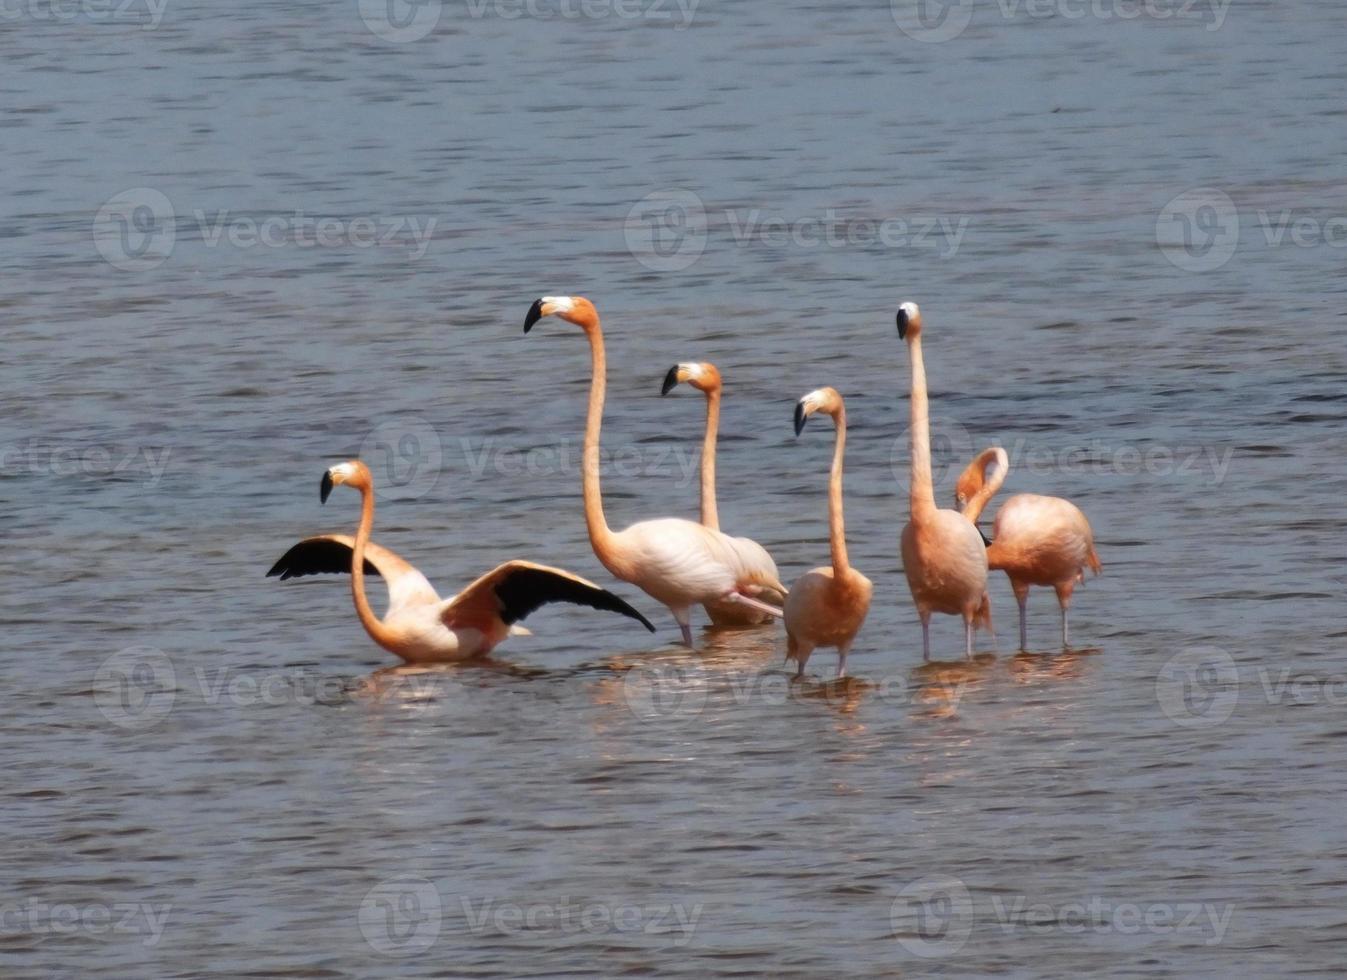 vilda flamingo (phoenicopterus gummi) foto